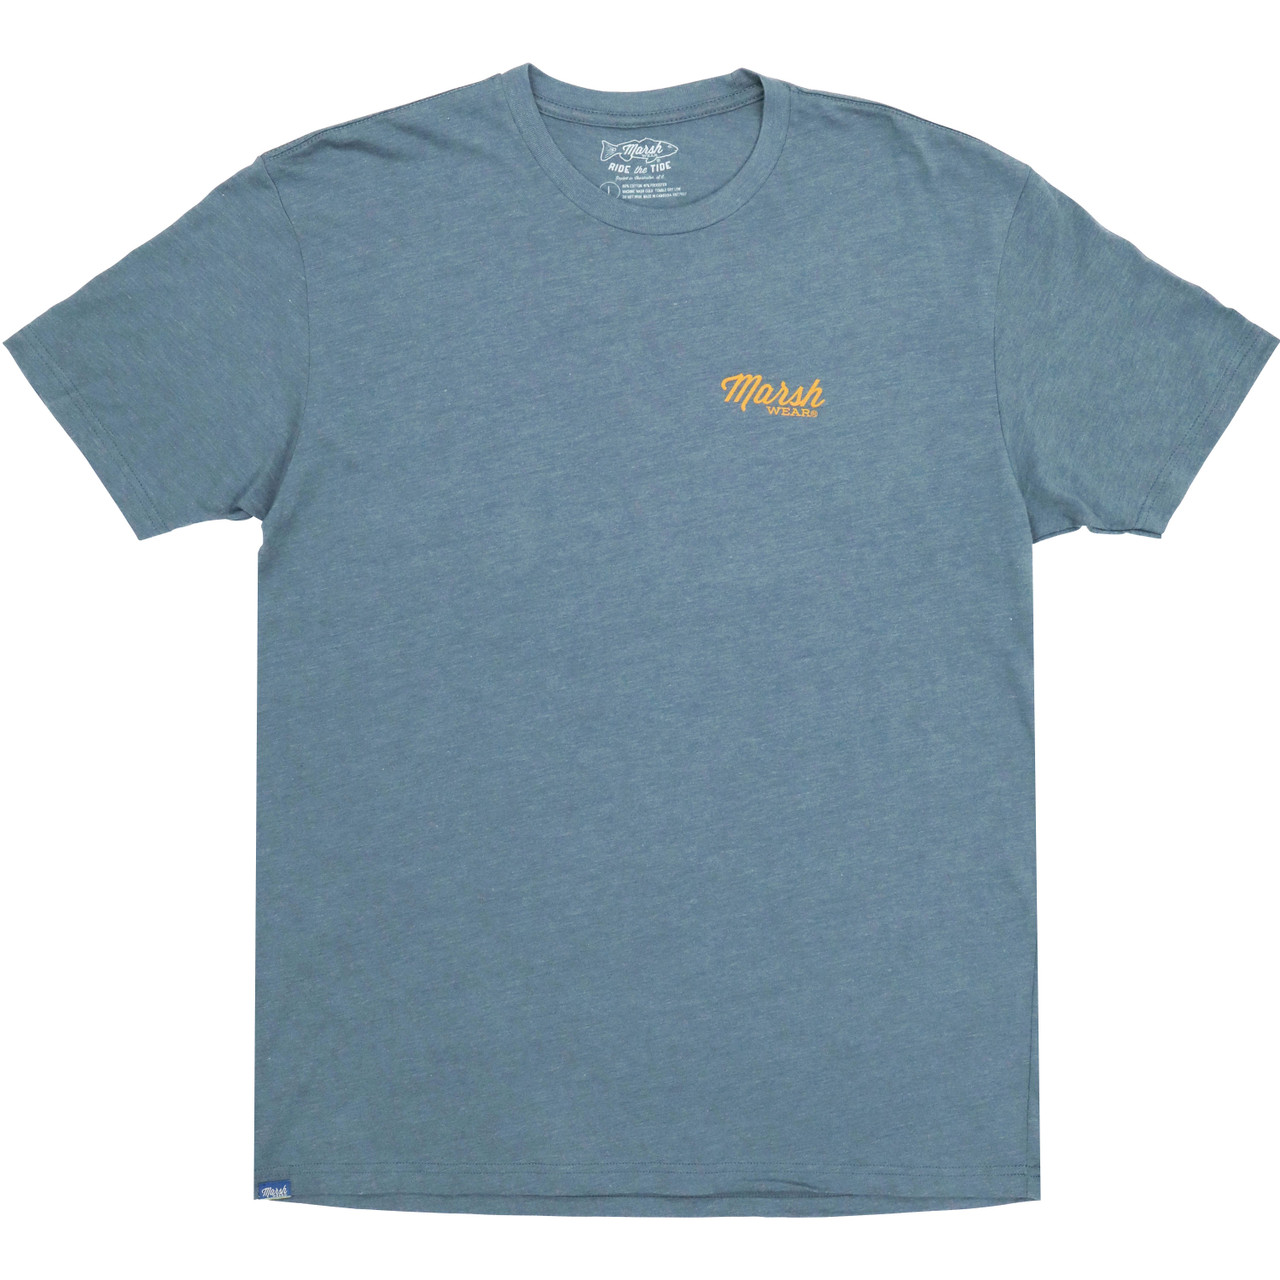 Marsh Wear MWT3046 Stripes T-Shirt Indigo Heather - Front